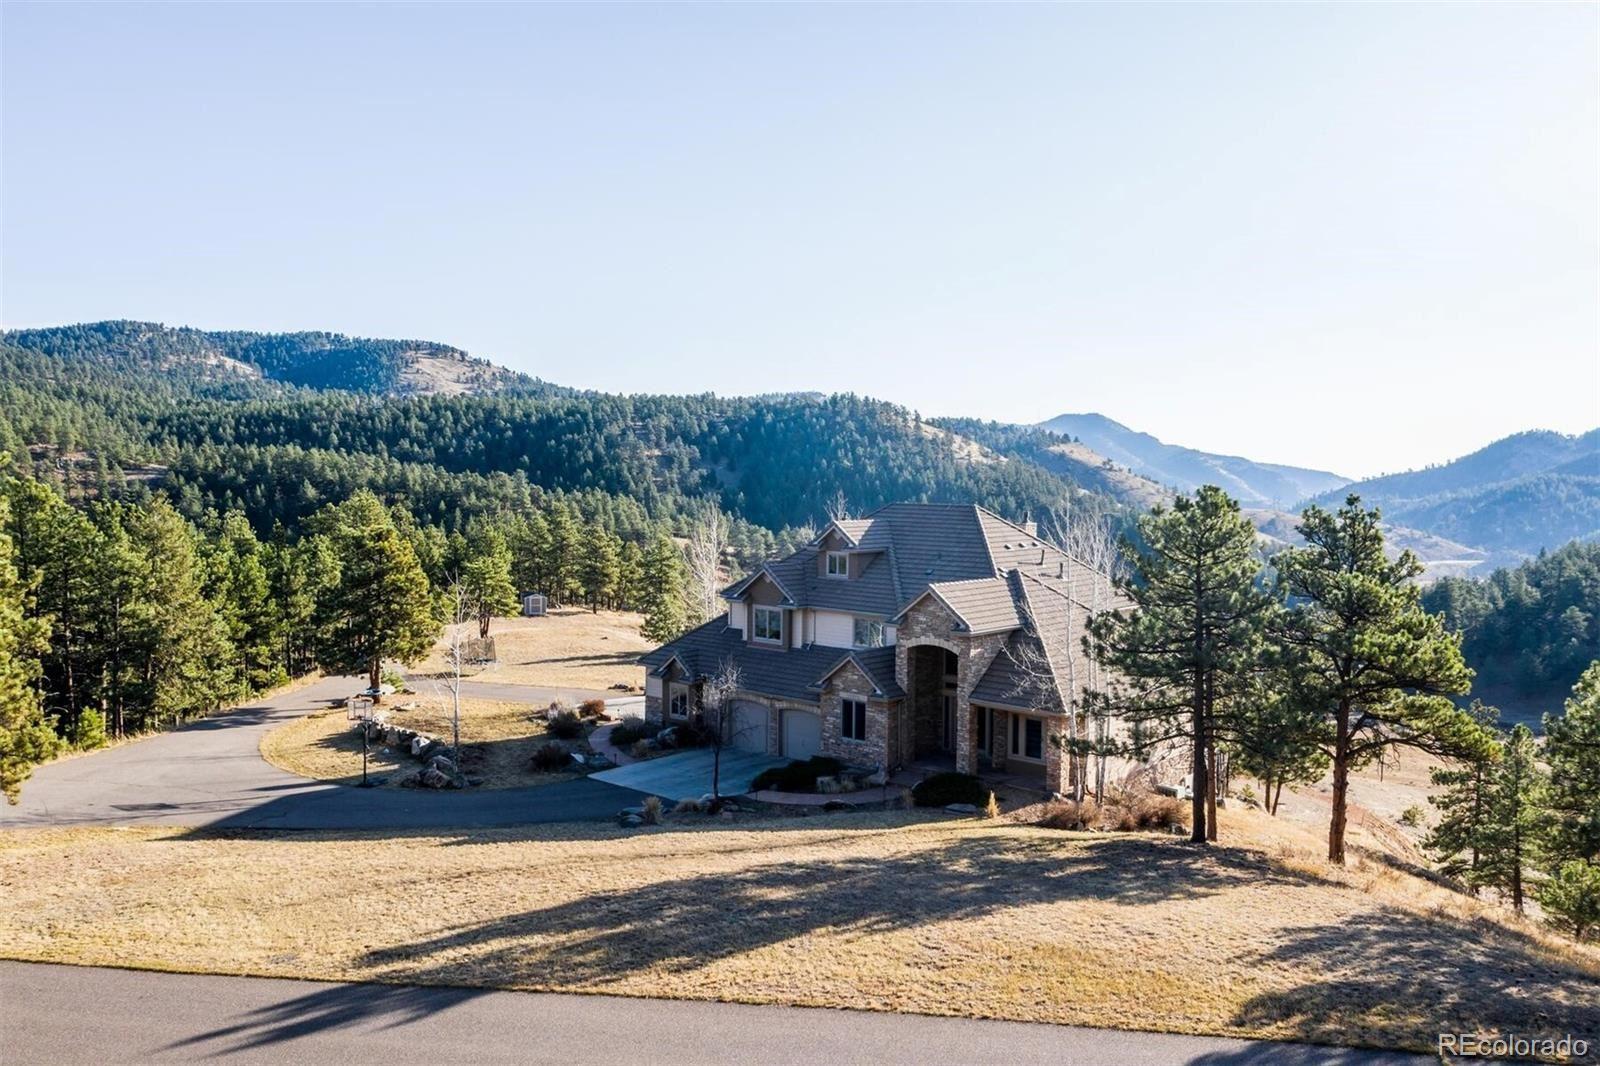 25576 Elk Range Road, Evergreen, CO 80439 - #: 9764033